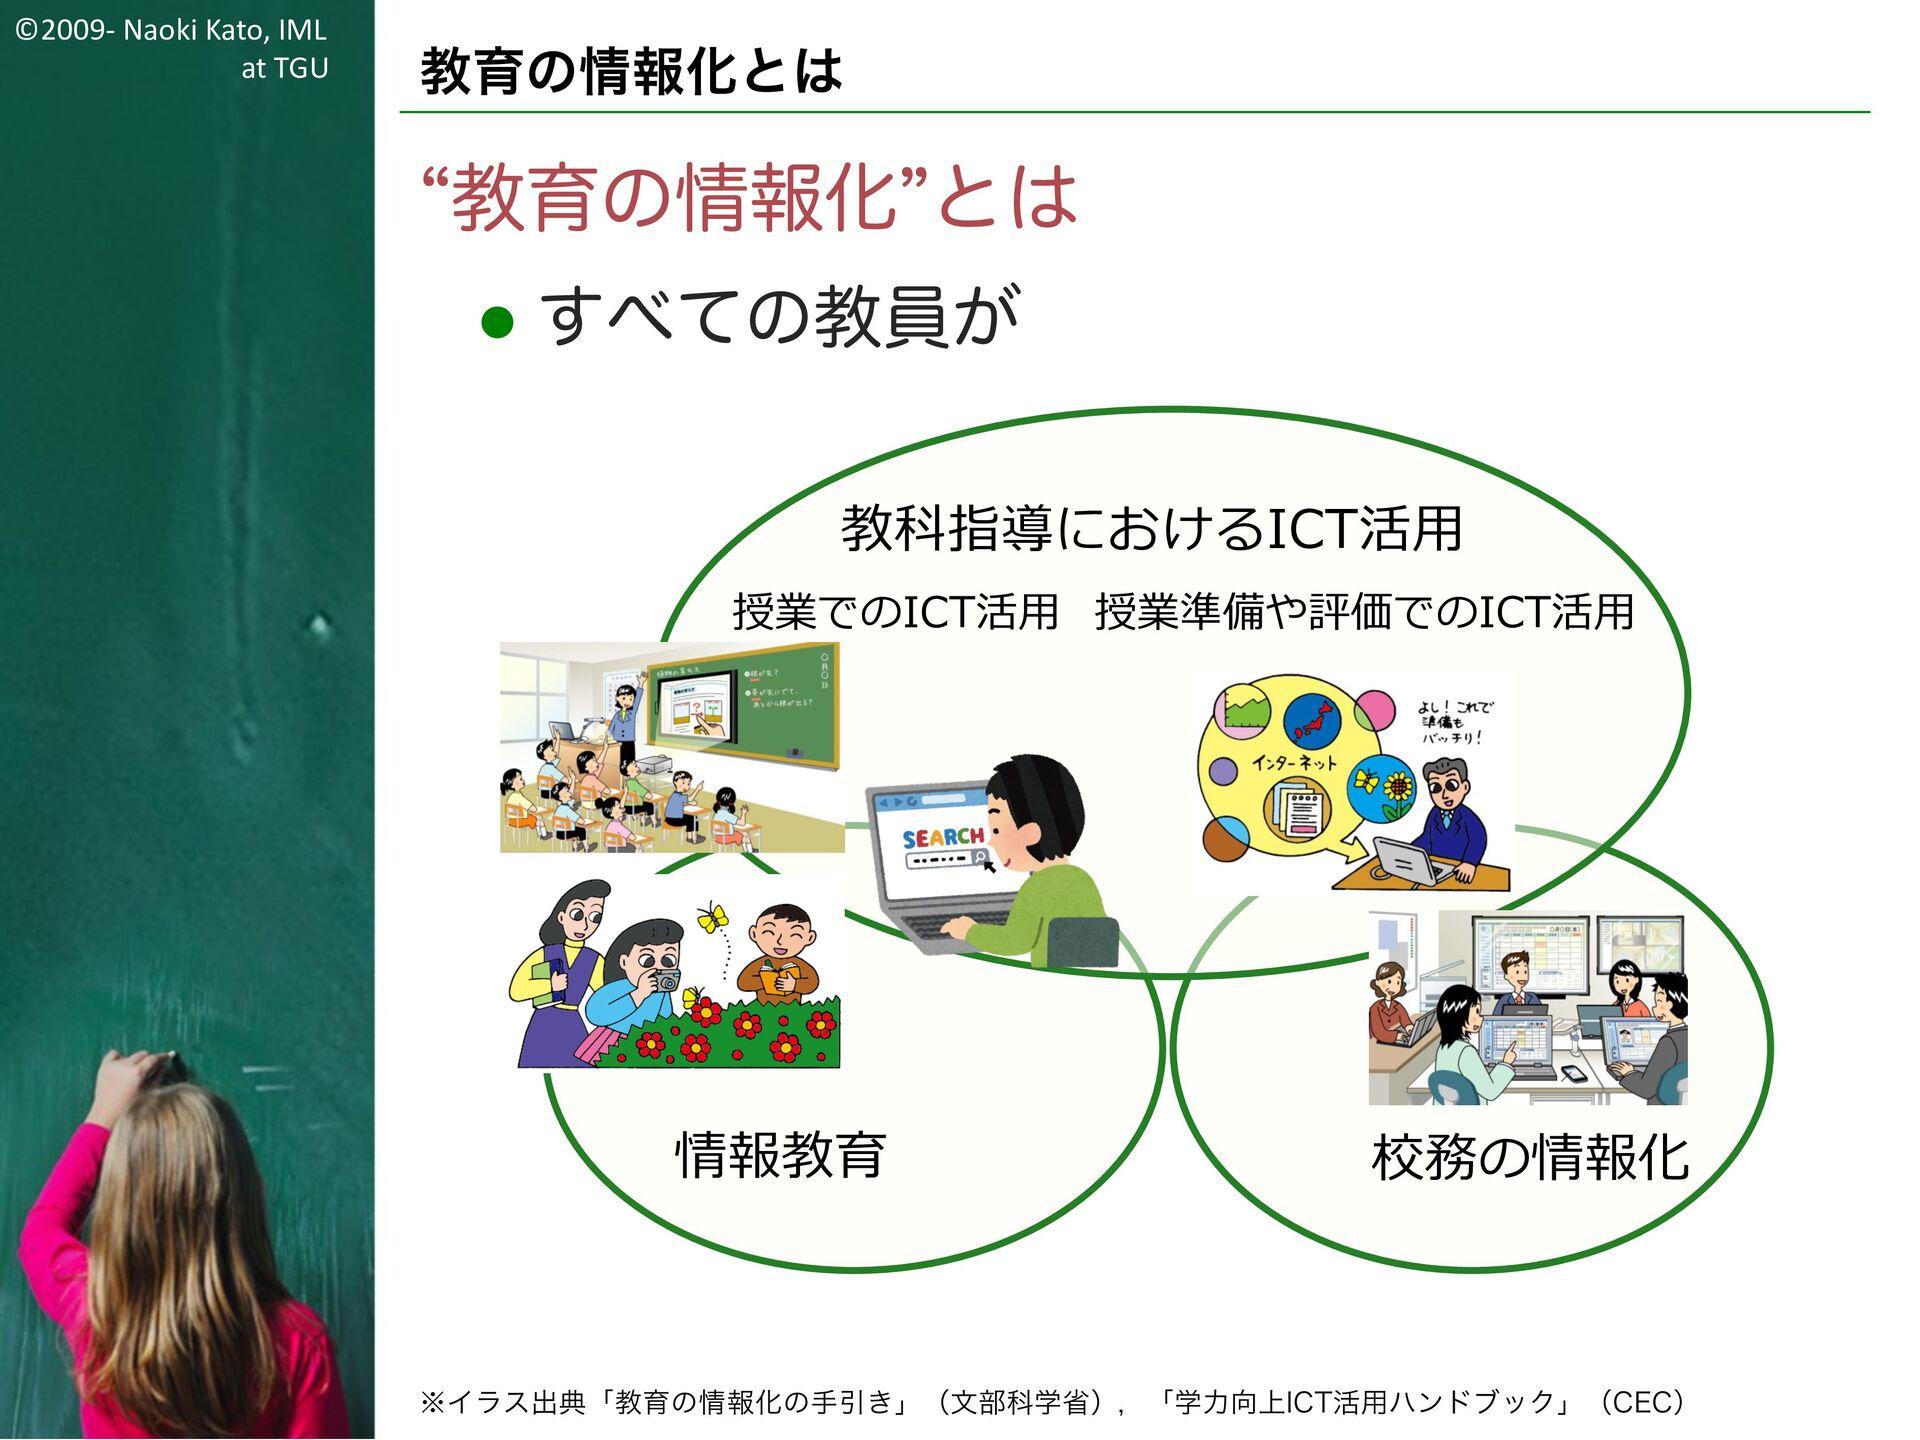 "©2009- Naoki Kato, IML at TGU 教育の情報化とは ""教育の情報化""..."